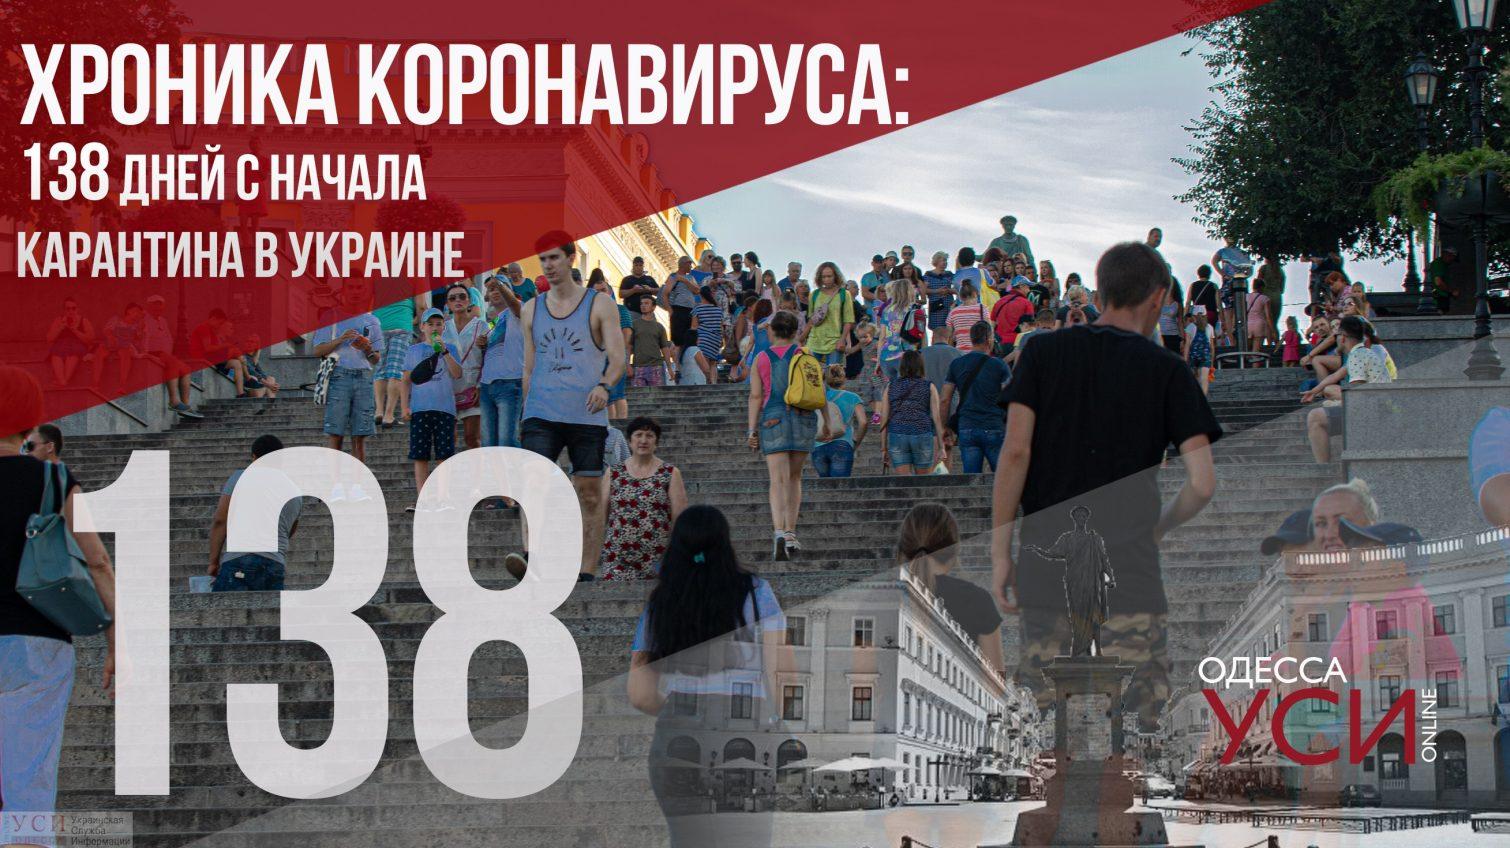 Хроника коронавируса: 138 дней с начала карантина в Украине ОБНОВЛЯЕТСЯ «фото»